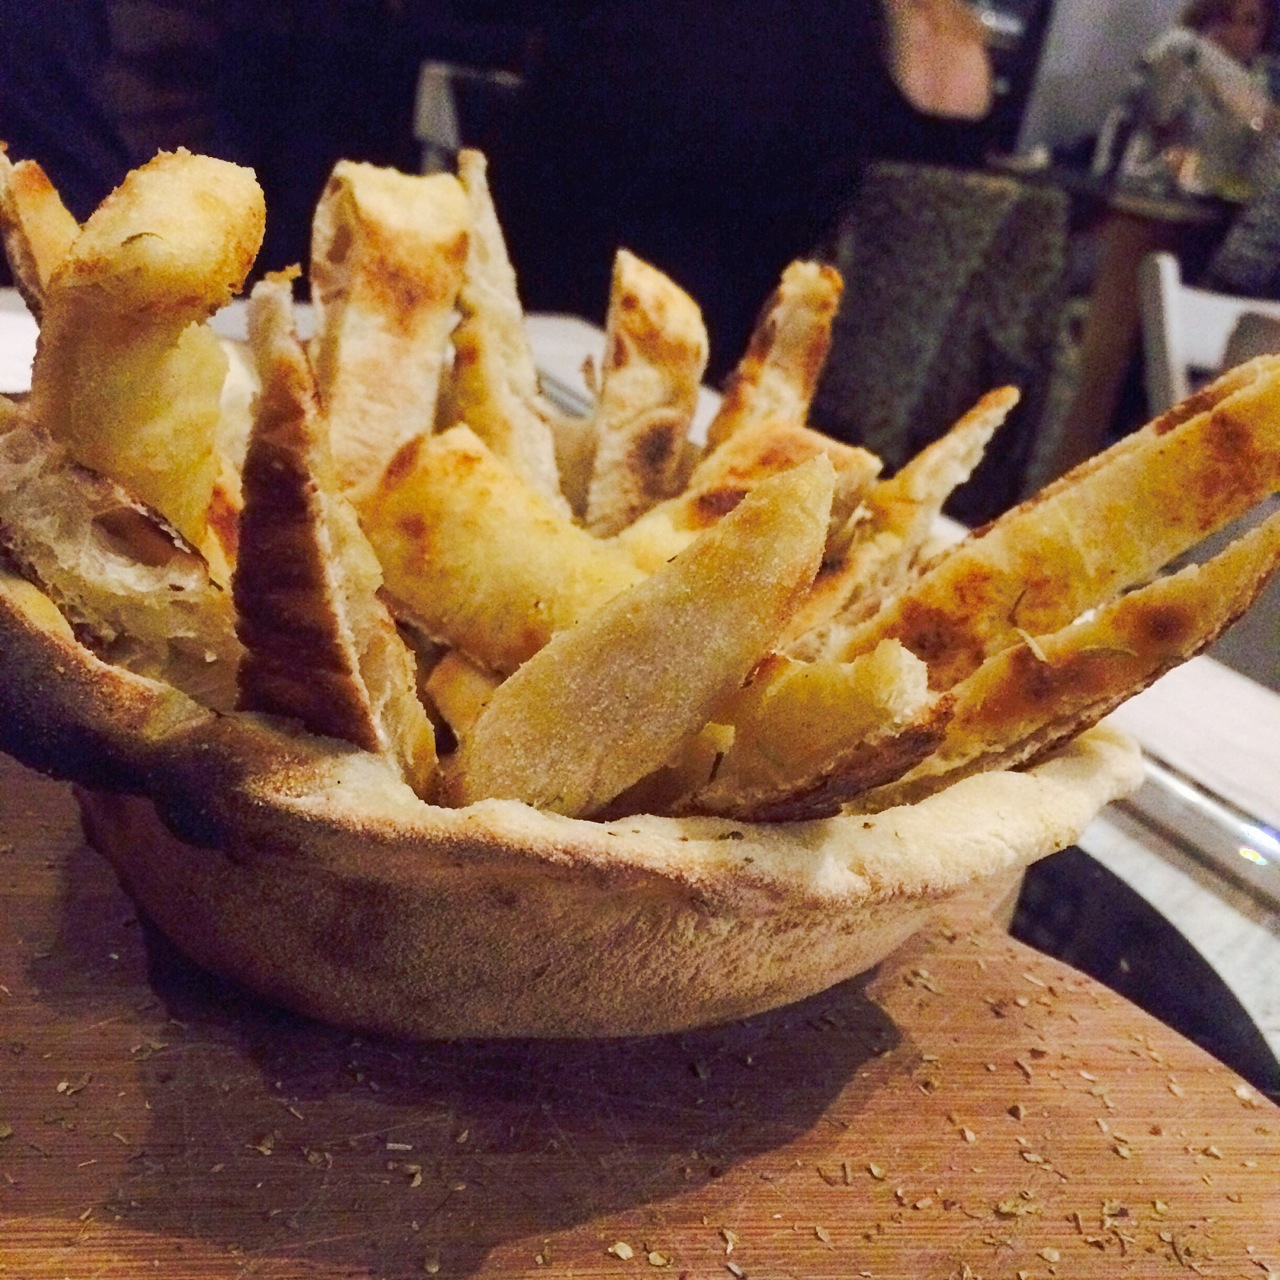 http://fatgayvegan.com/wp-content/uploads/2015/11/Vegan-bread-basket.jpg